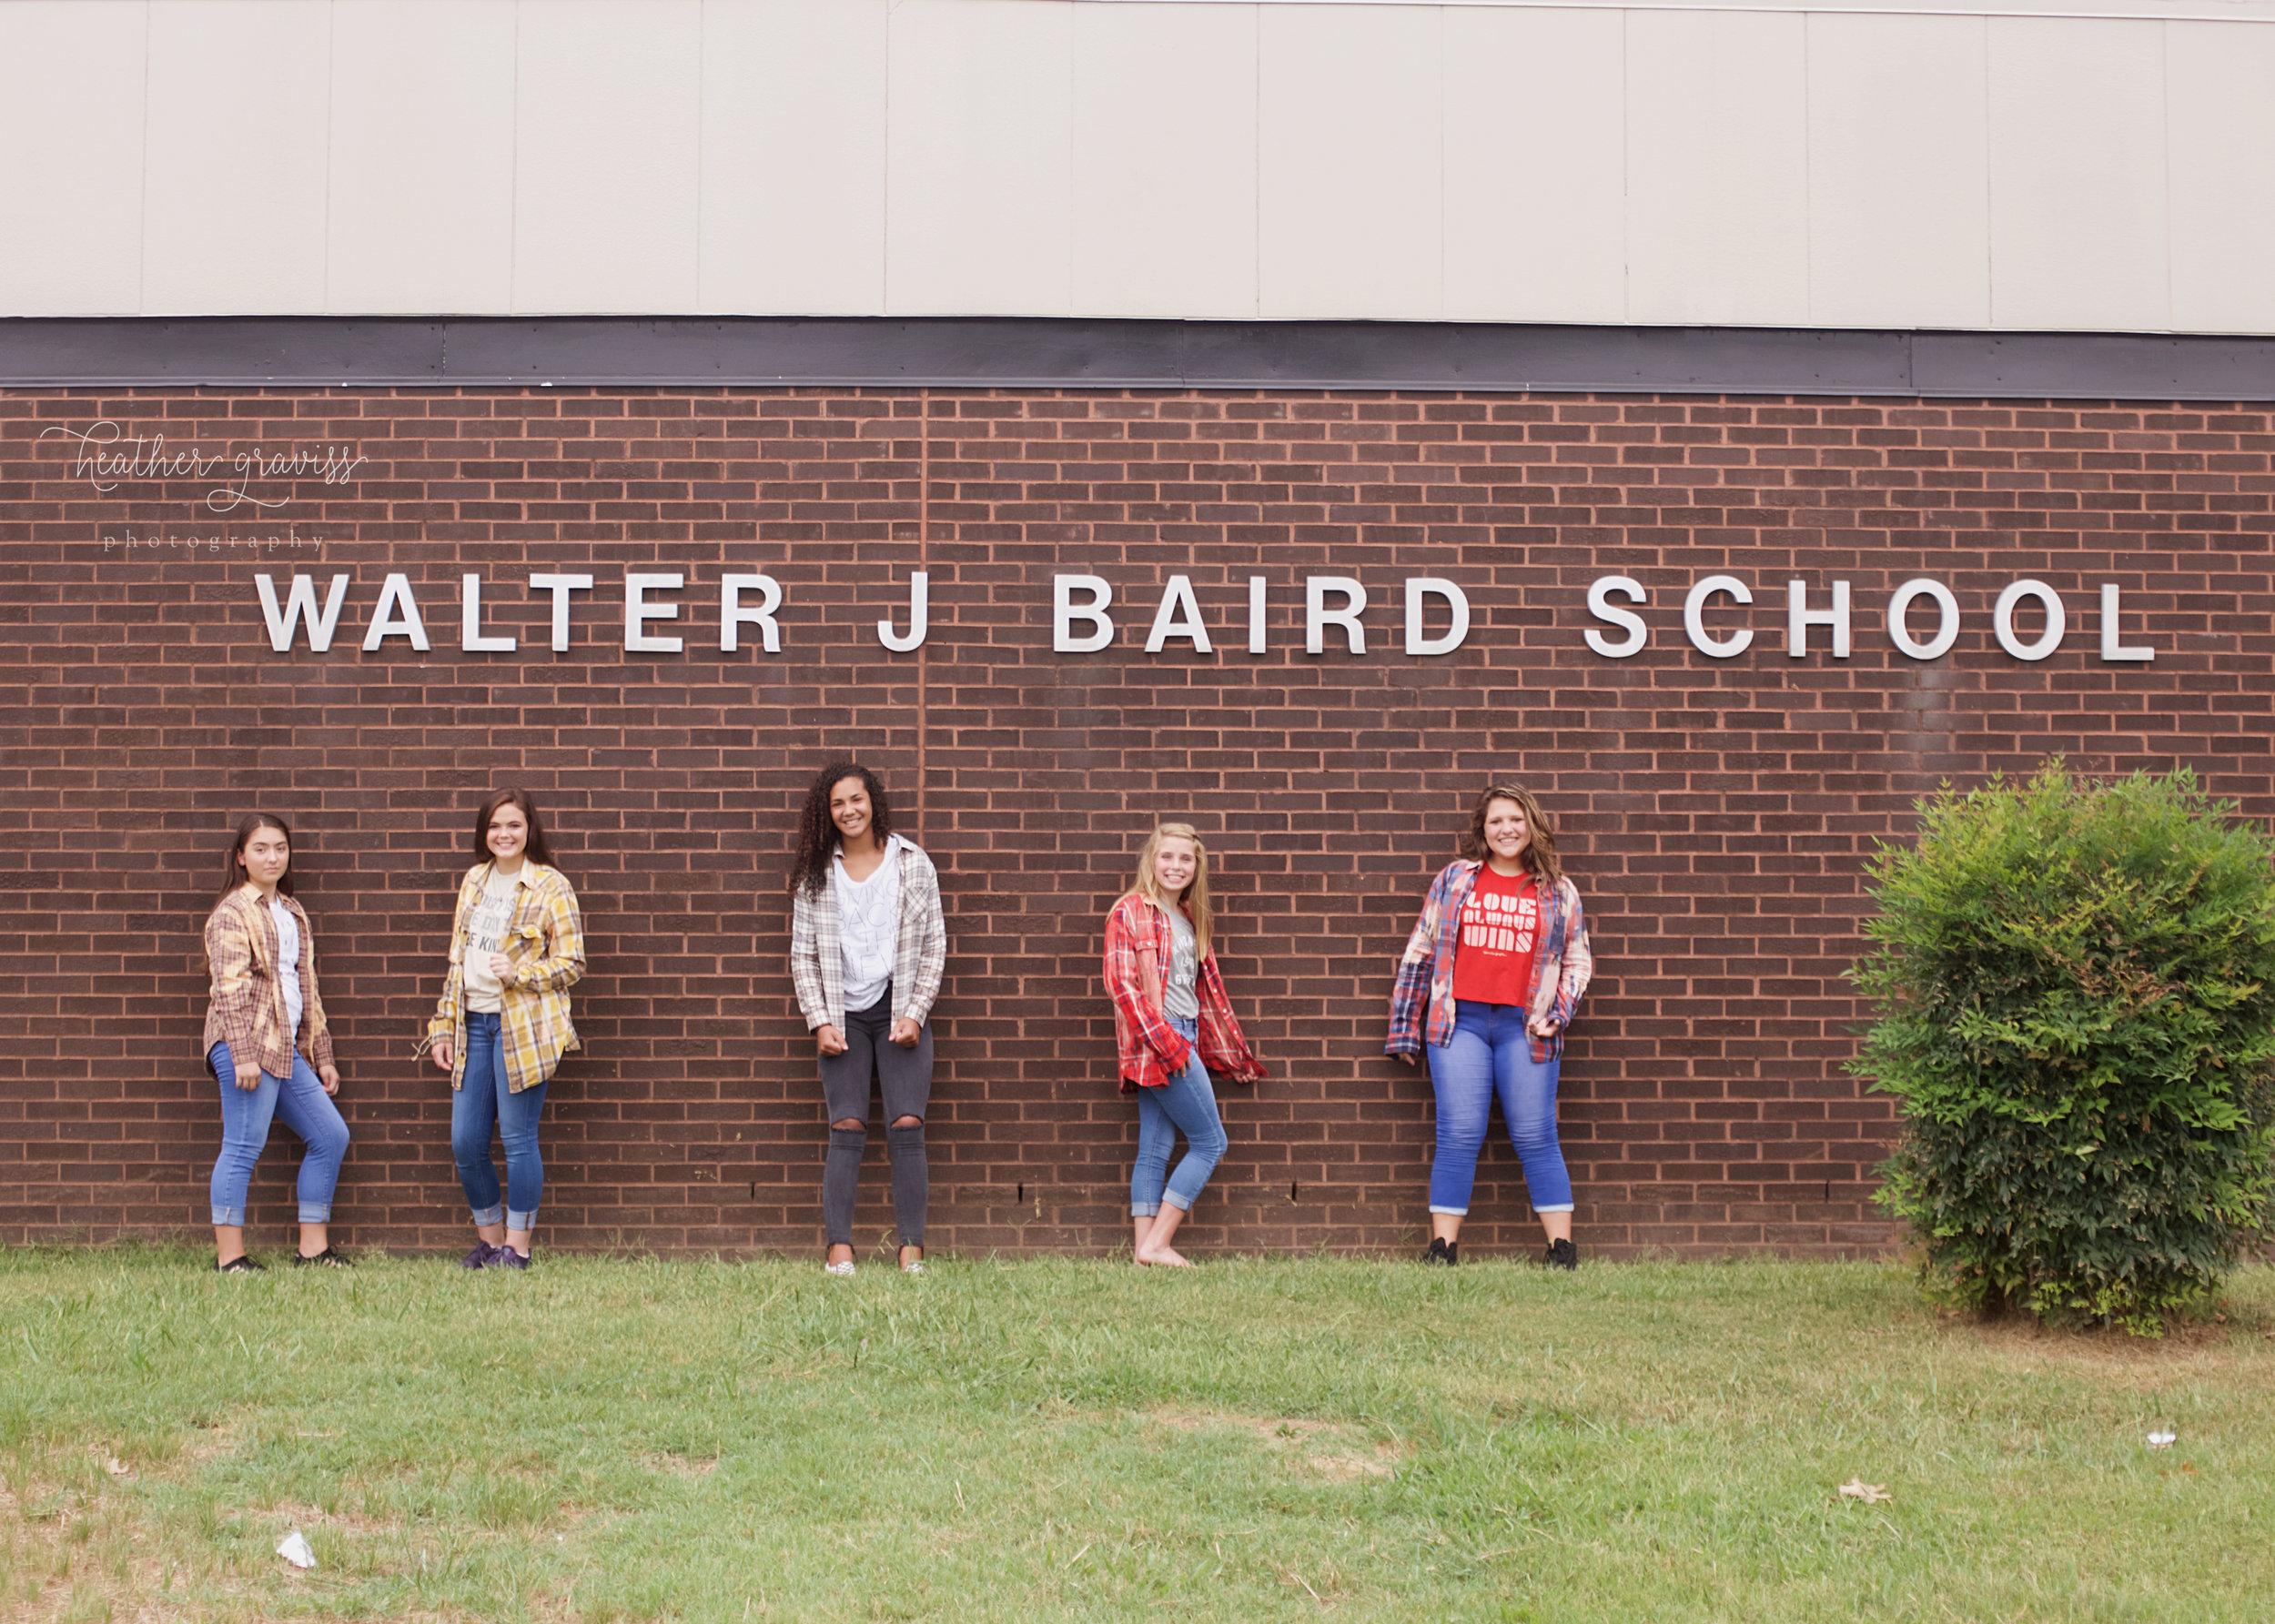 baird-middle-school.jpg